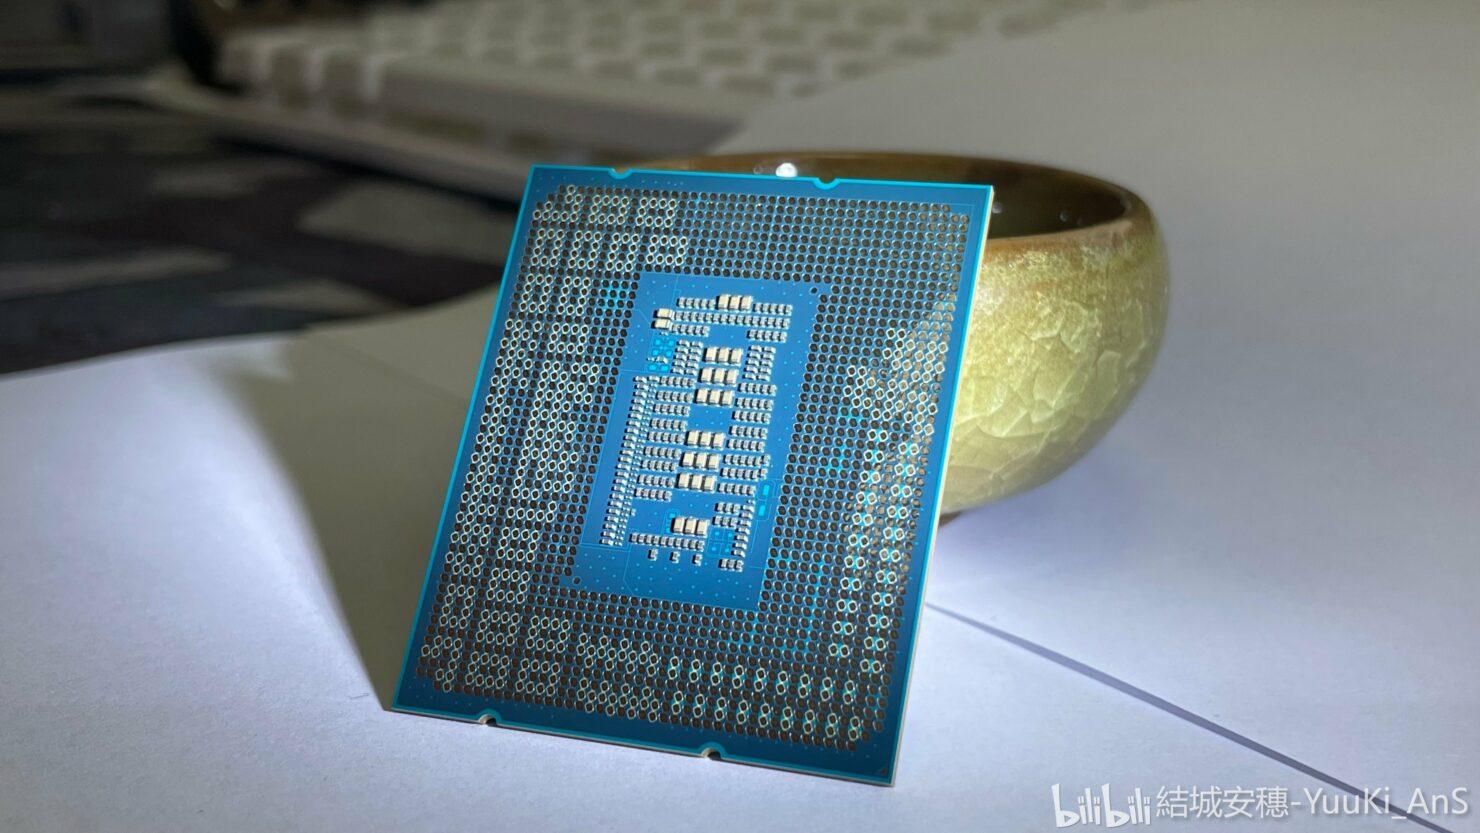 intel-alder-lake-core-i9-12900k-desktop-cpu-_4